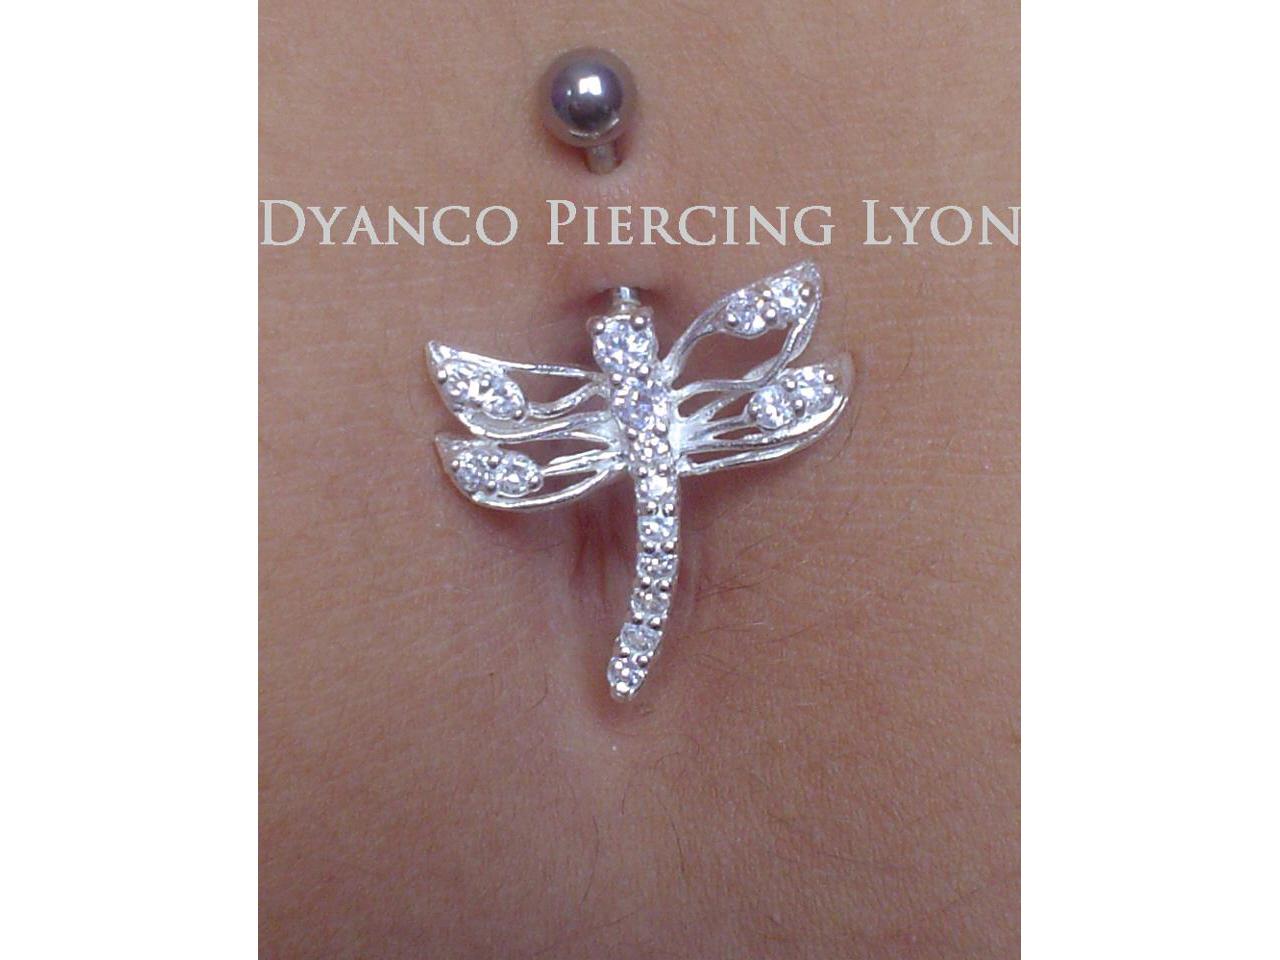 dyanco piercing lyon 05.jpg